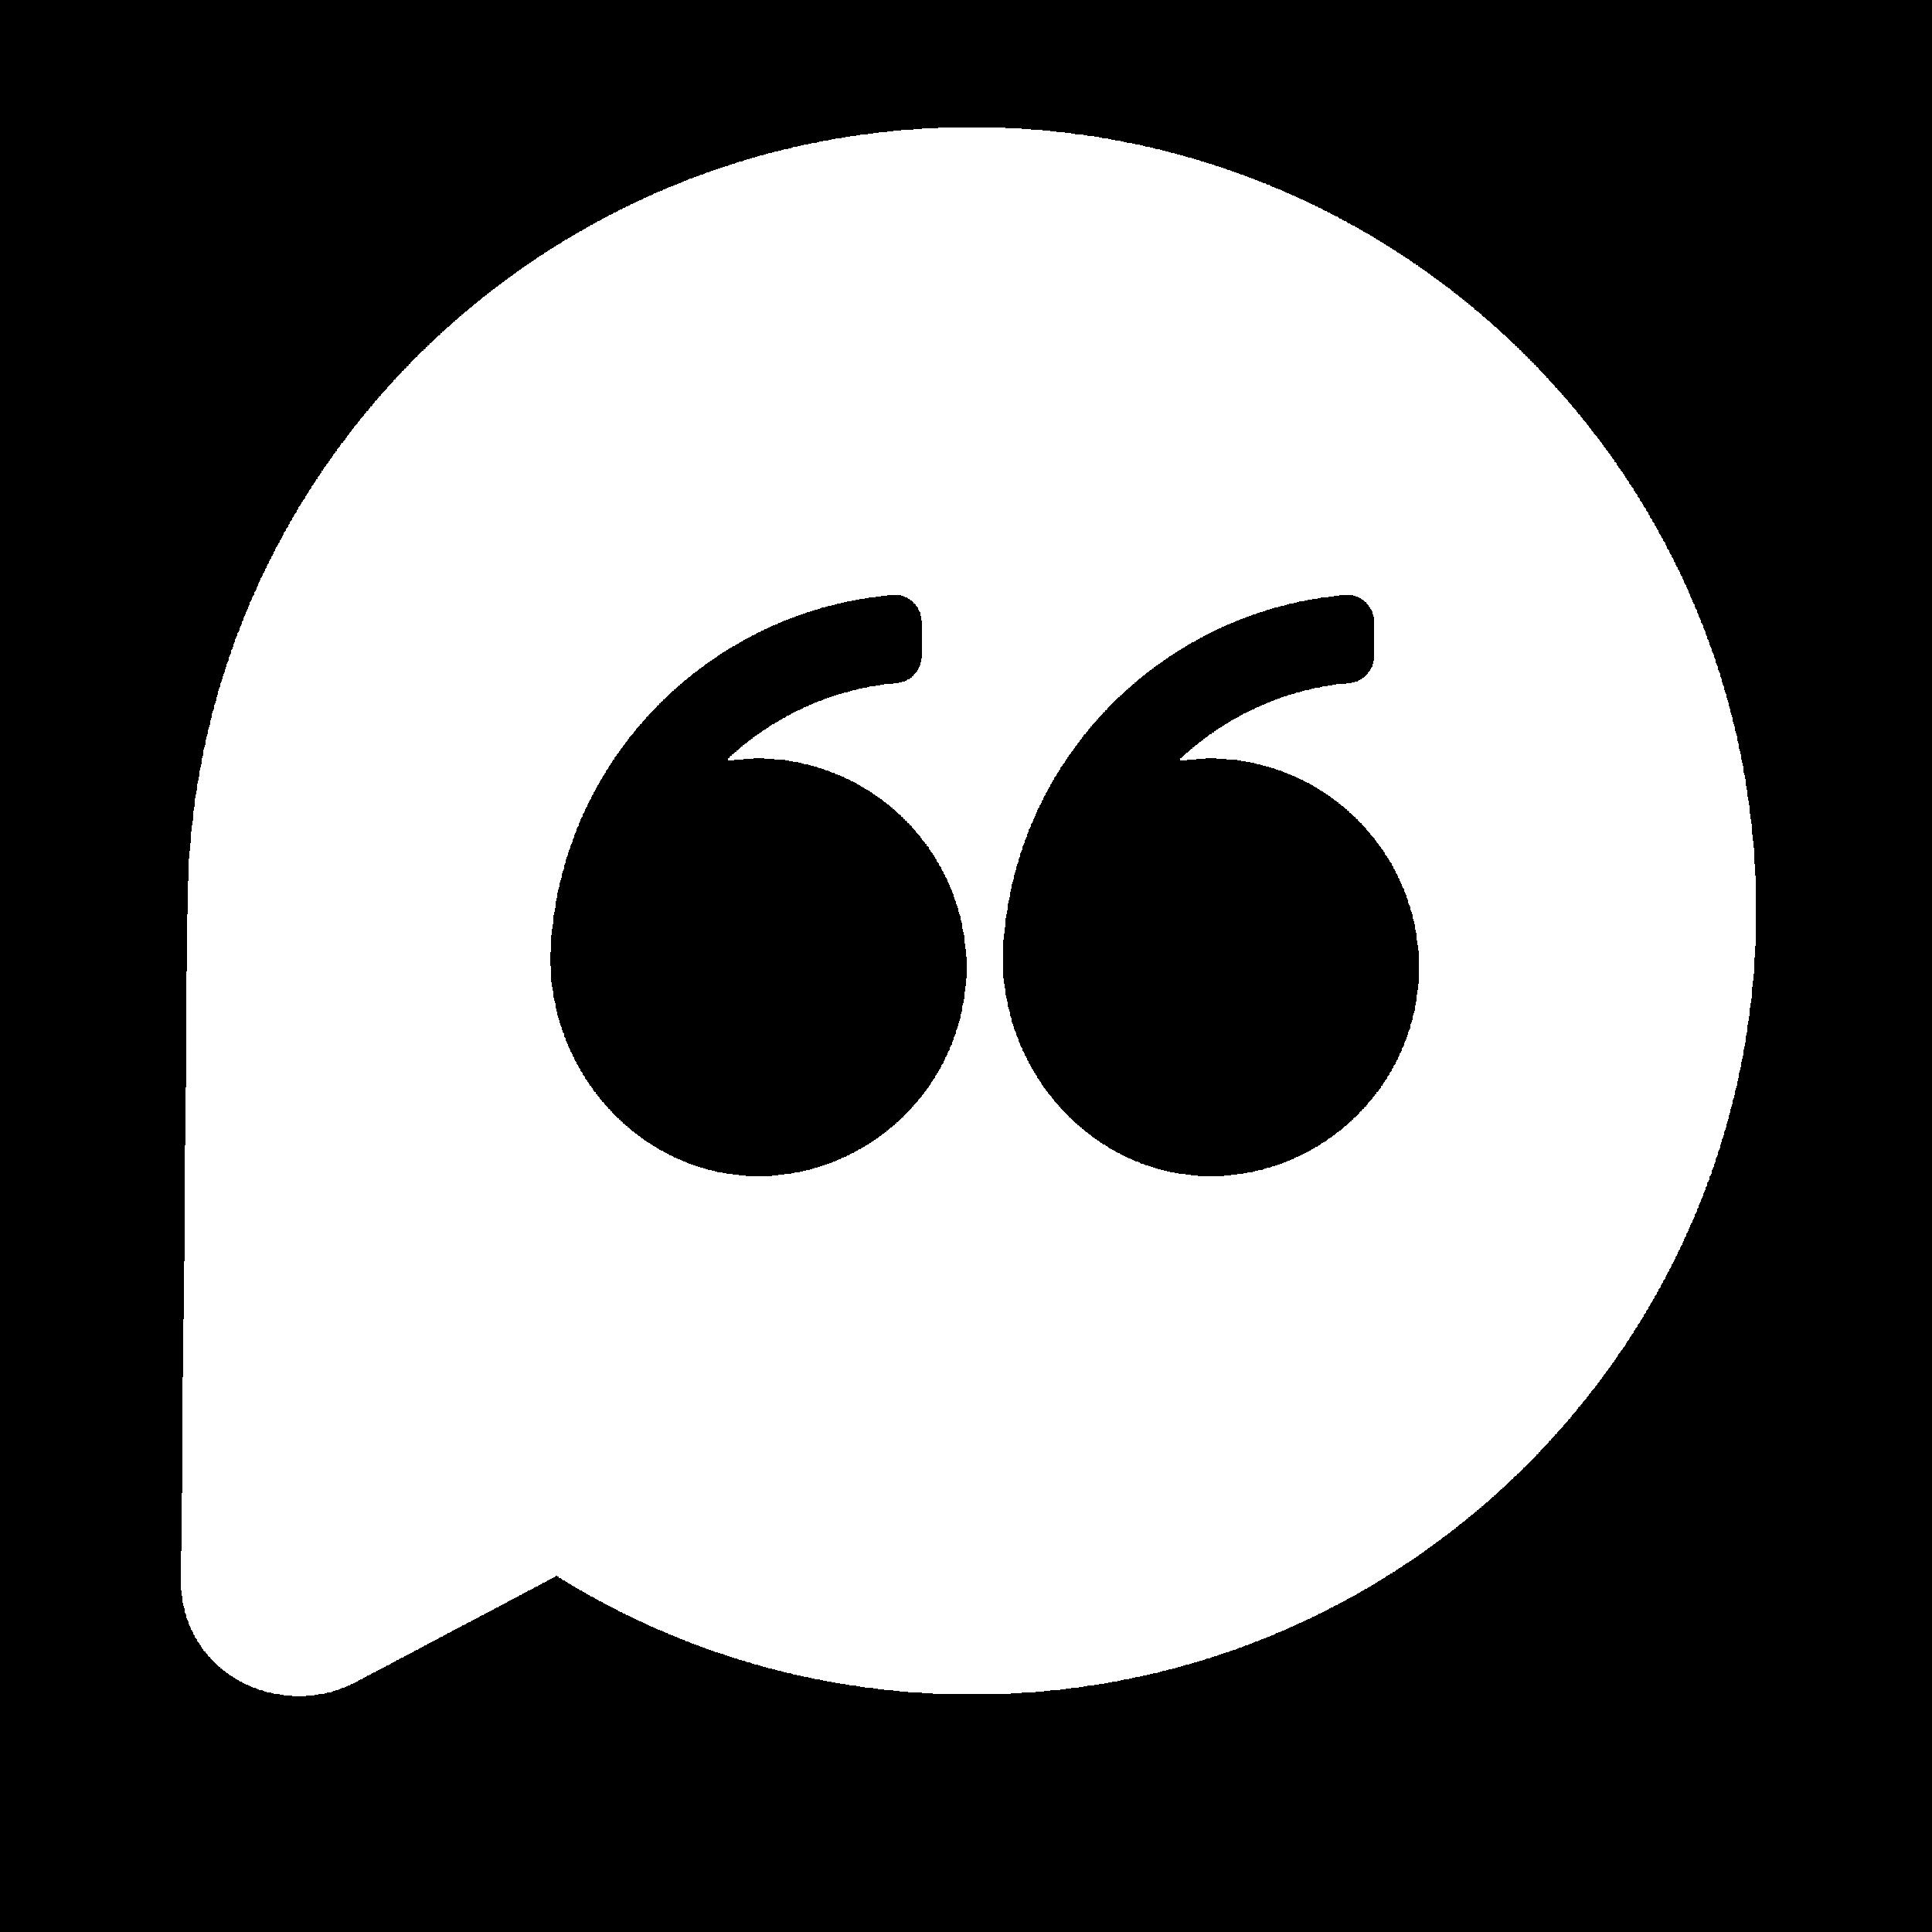 PHR-symbol-white.png